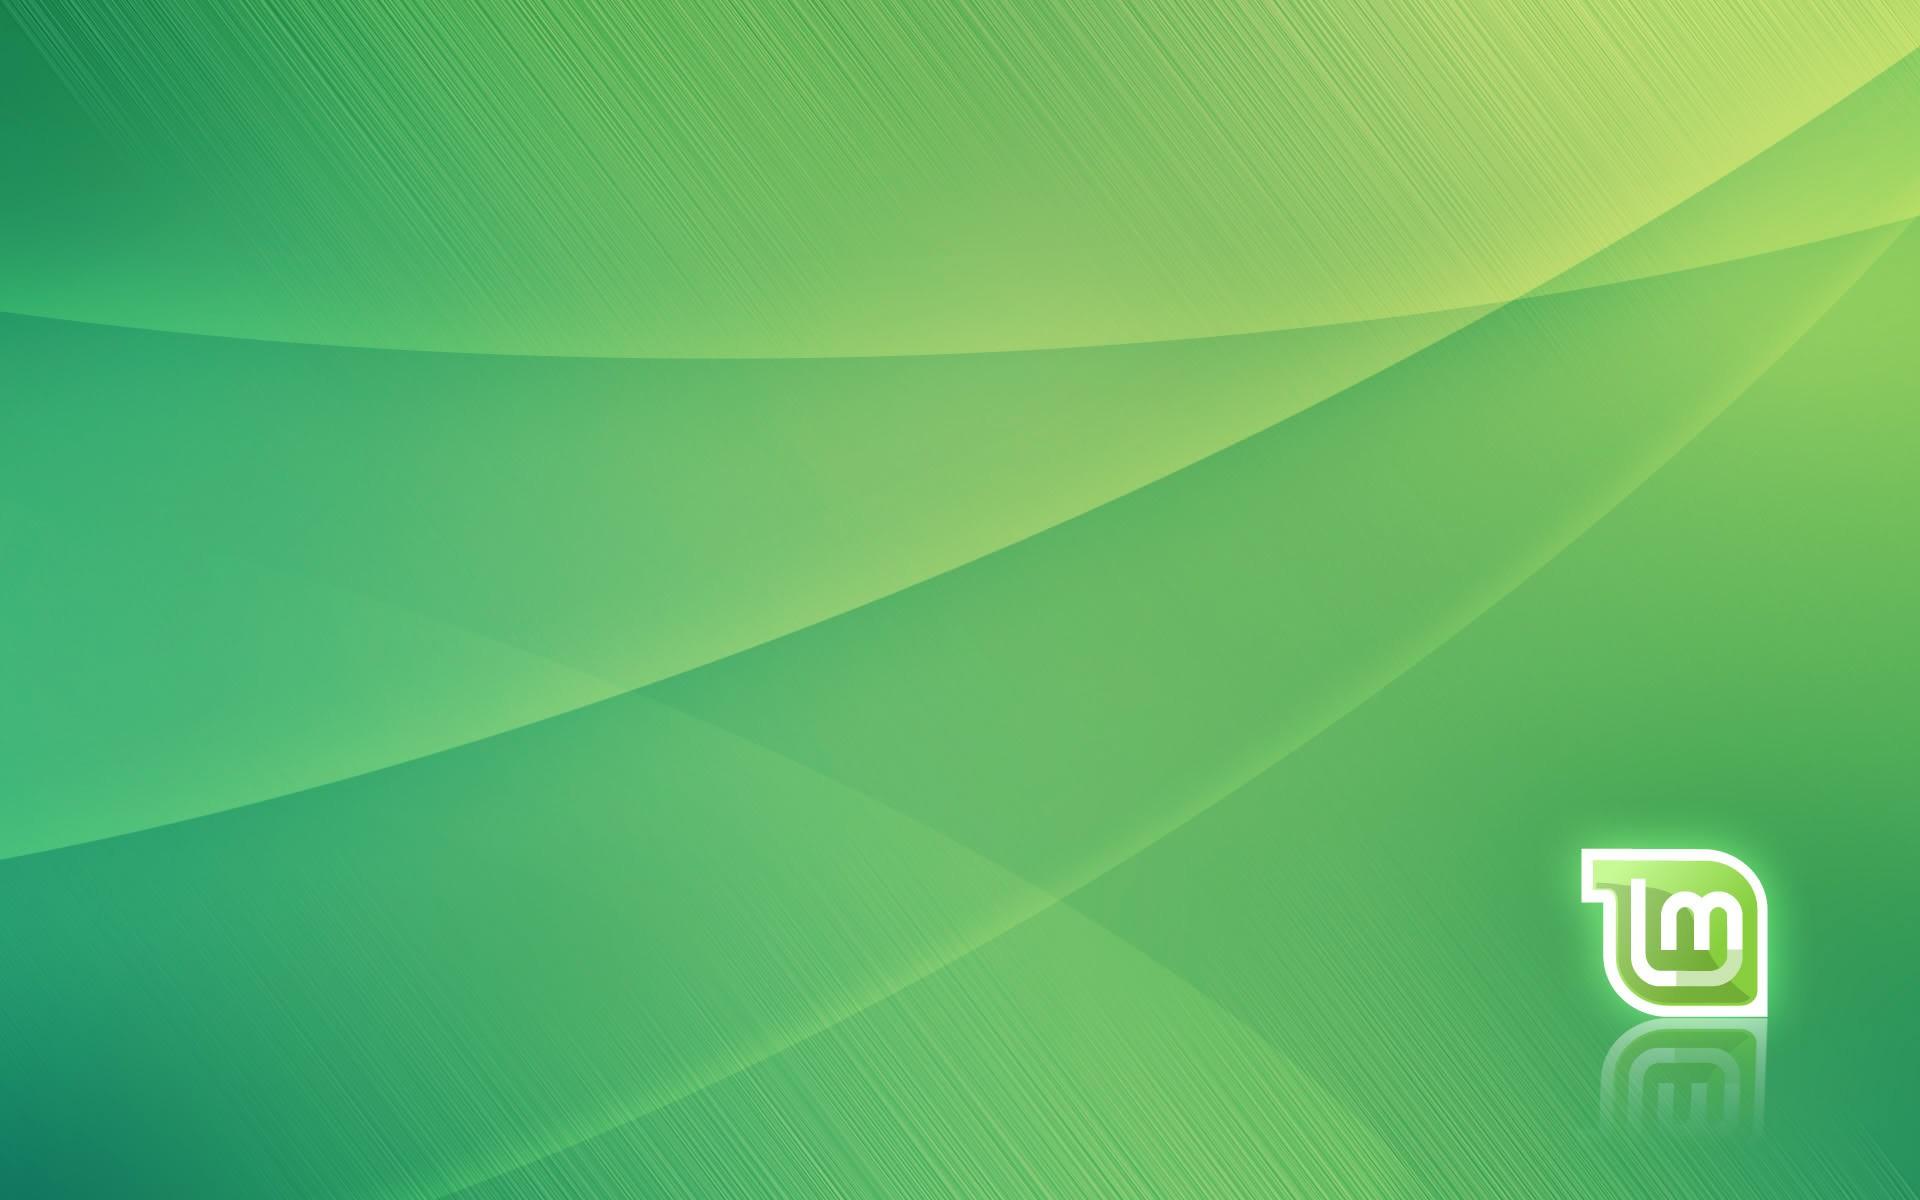 mint green wallpaper  u00b7 u2460 download free cool high resolution wallpapers for desktop  mobile